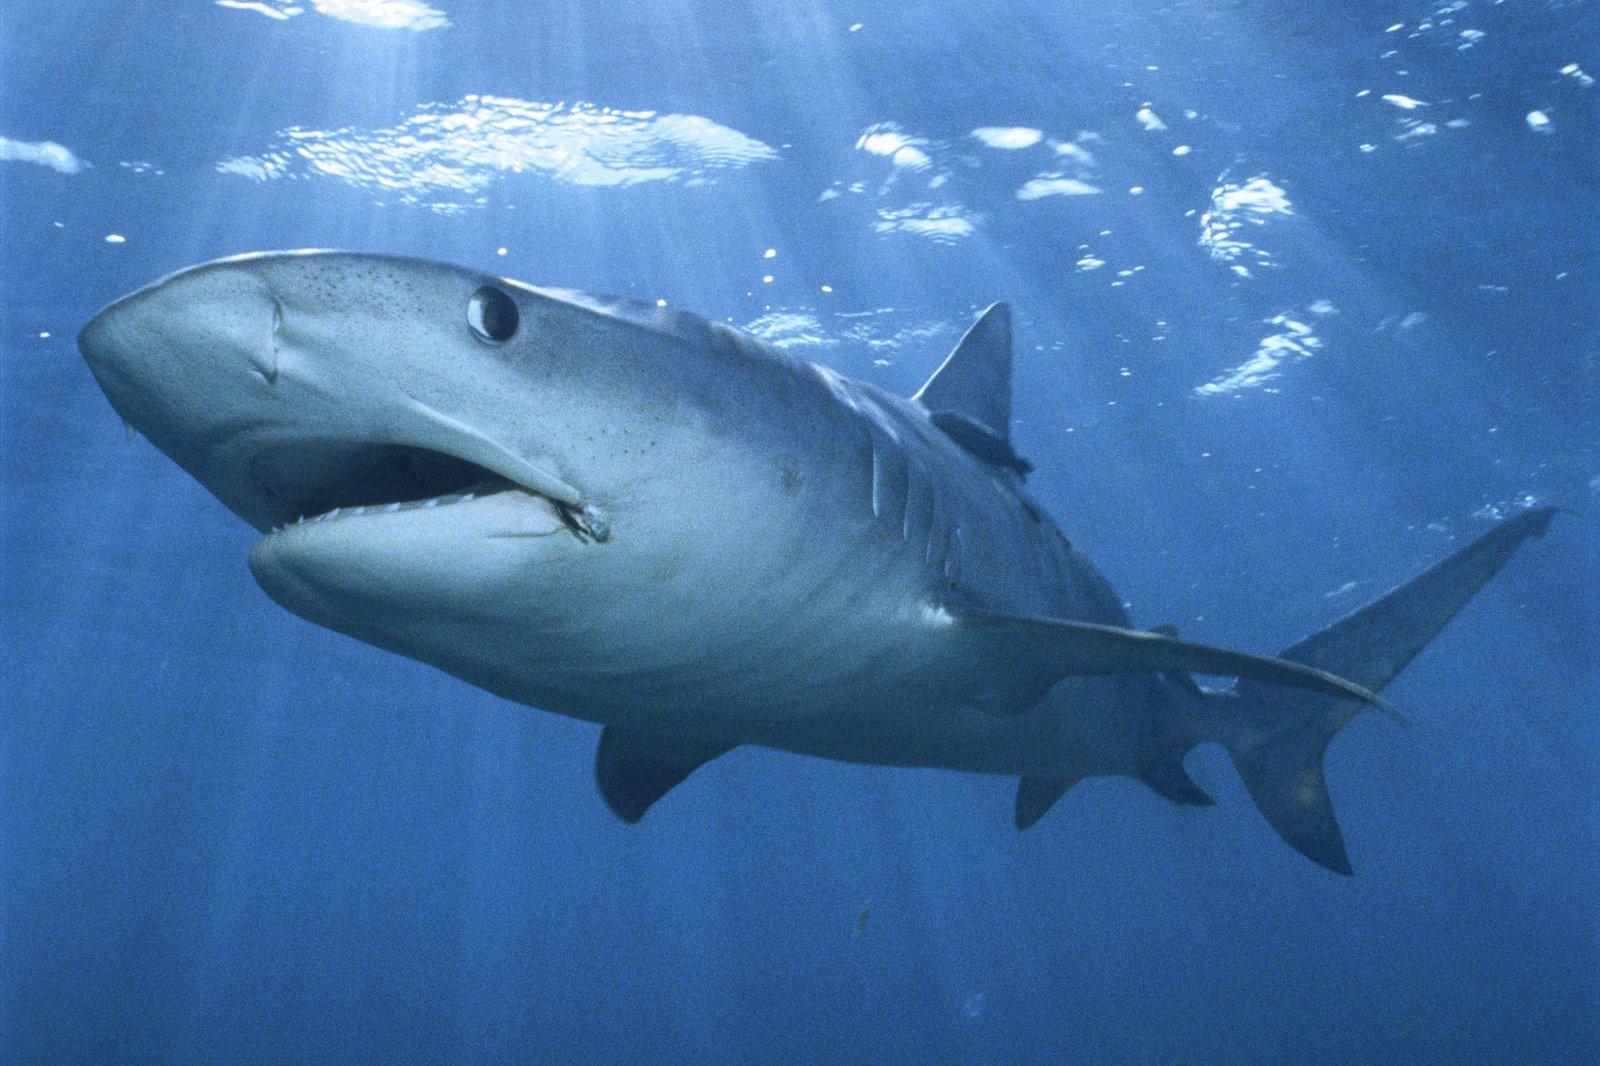 Beautiful Wallpapers: shark desktop wallpaper